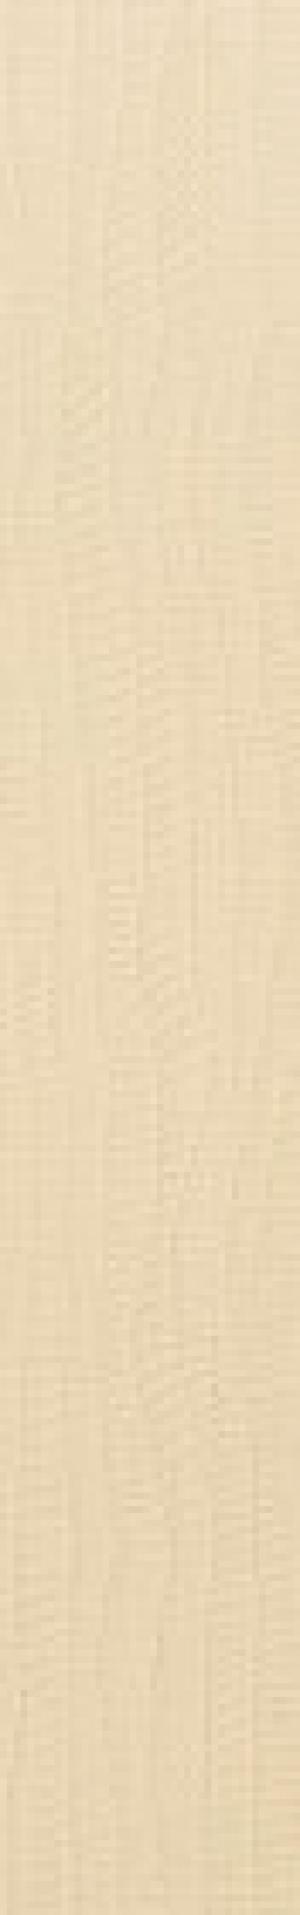 Dlaždica-bordura 60x9,3 Rako Defile DDRST363 svetlobéžová